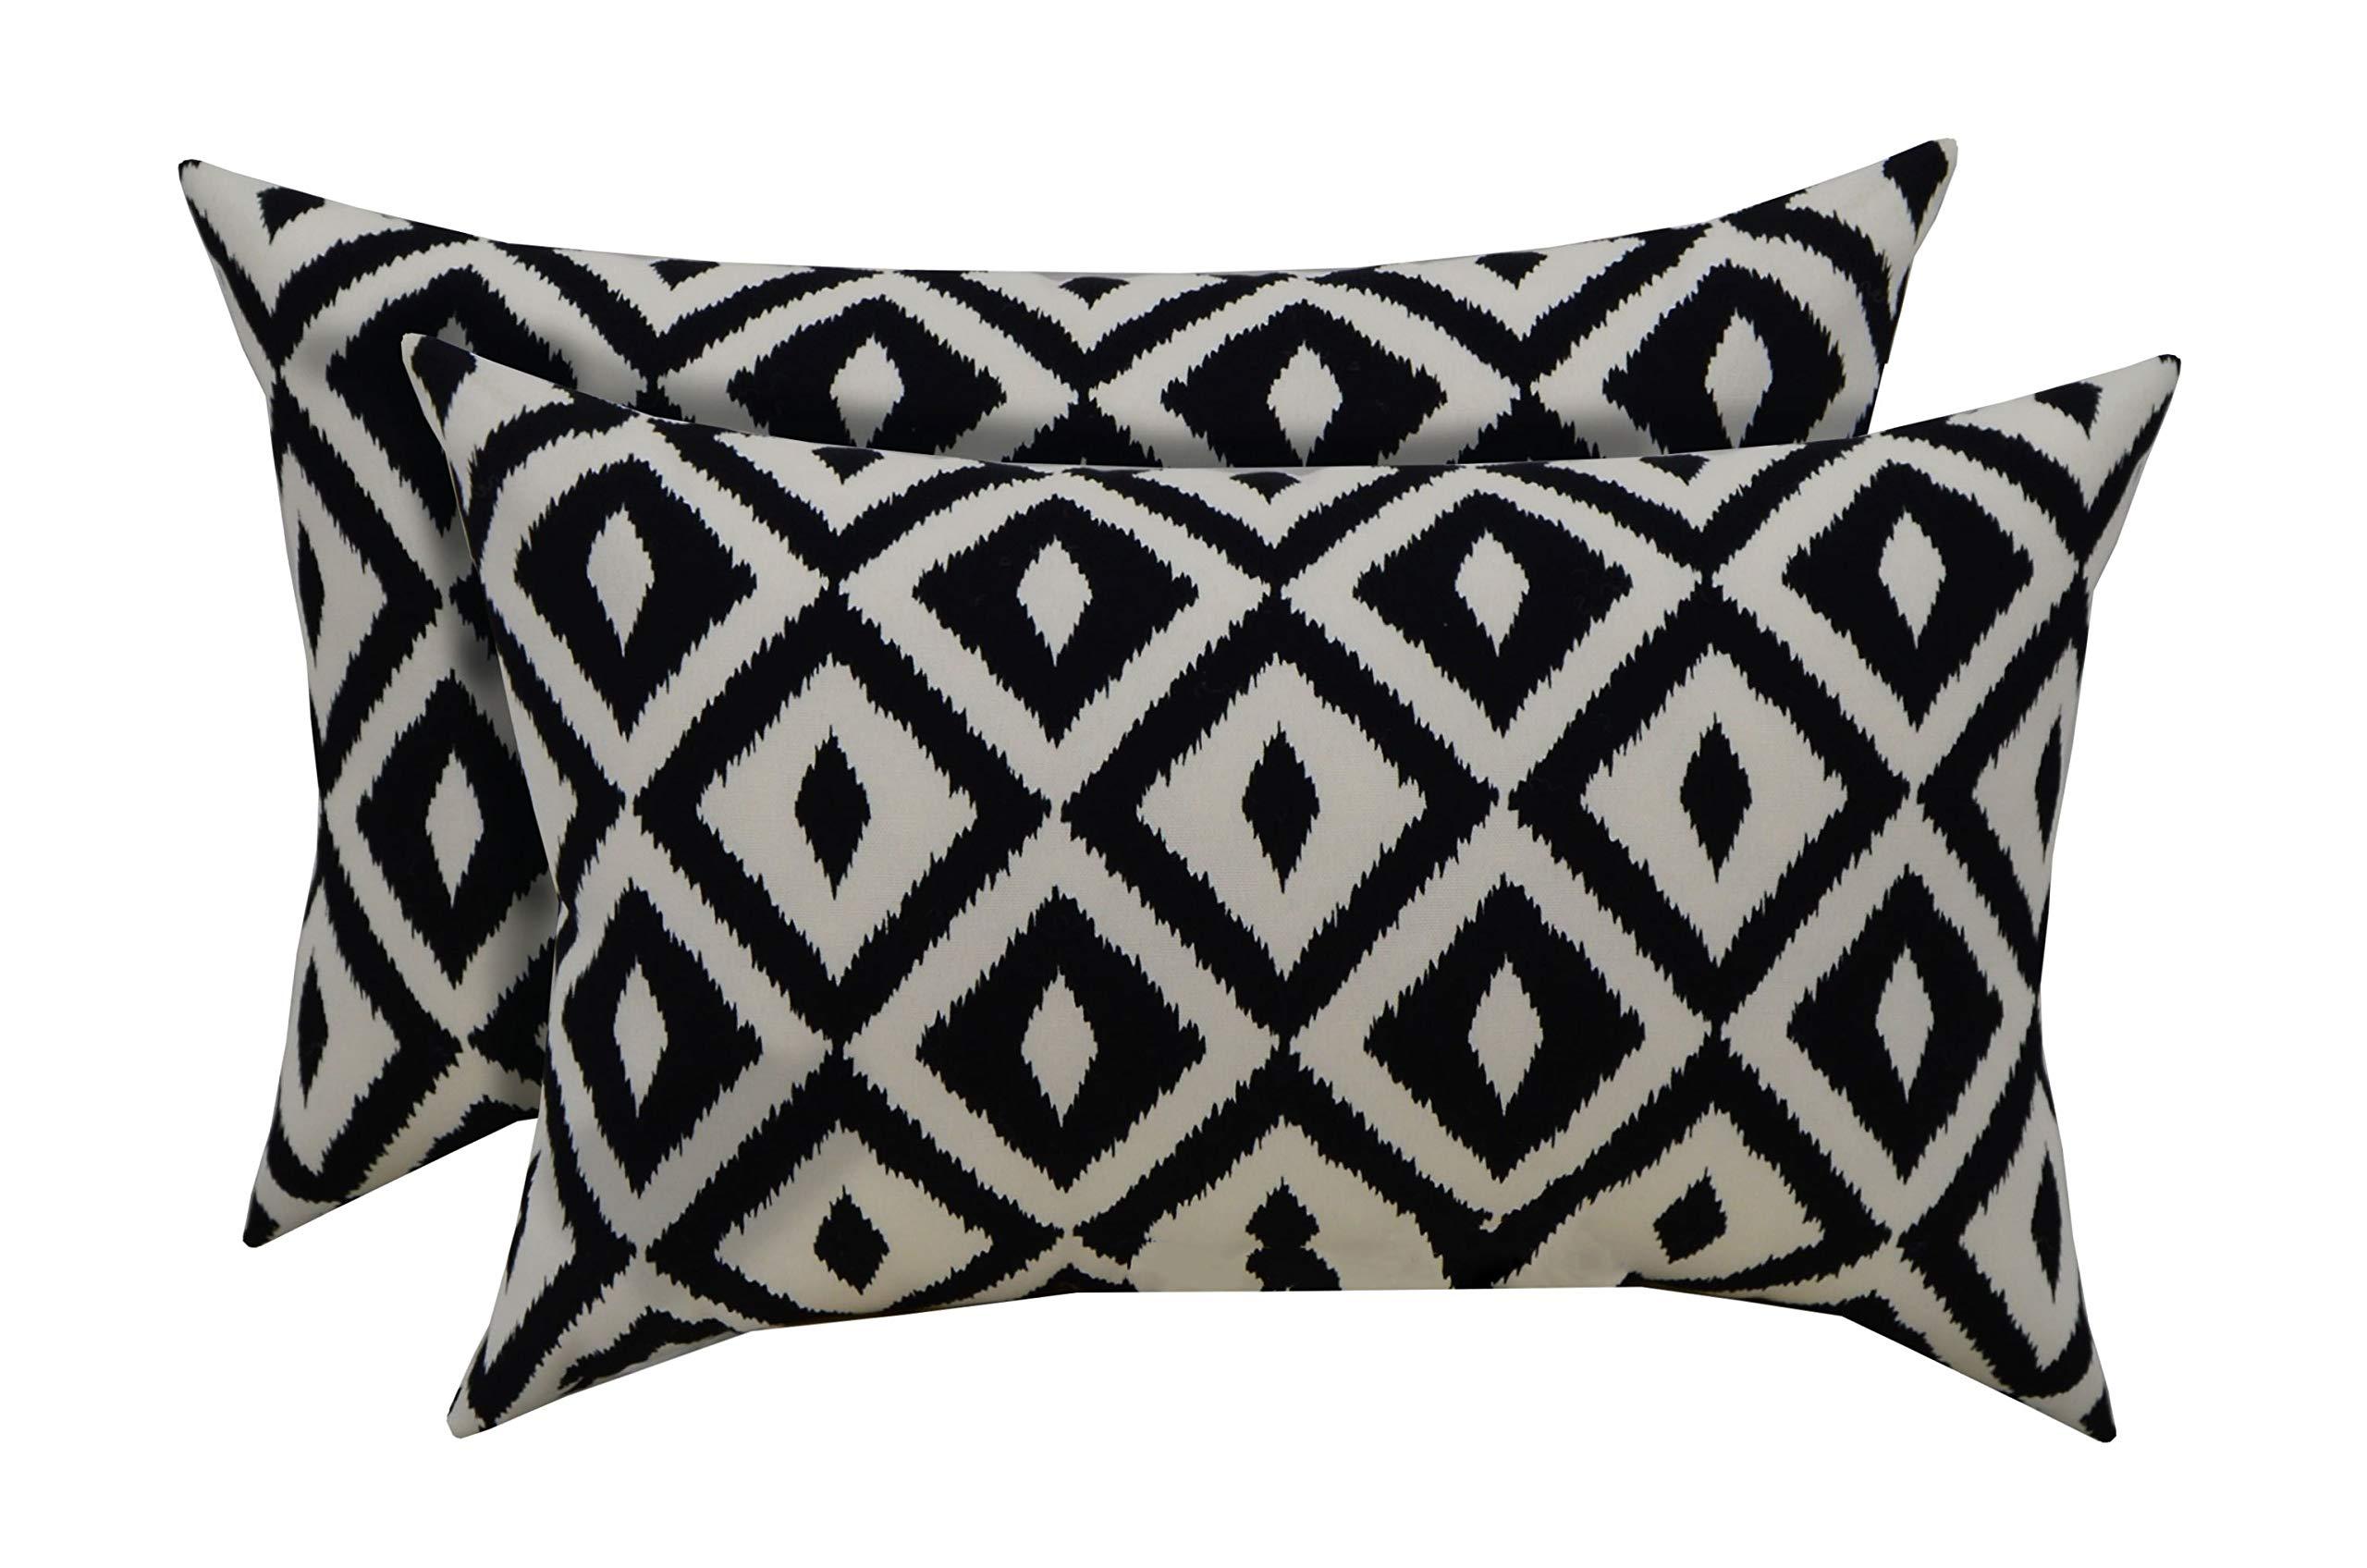 RSH Décor Indoor Outdoor Set of 2 Decorative Rectangular Lumbar Throw Pillows ~ Black and White Aztec Geometric Fabric (20'' W x 12'' H)